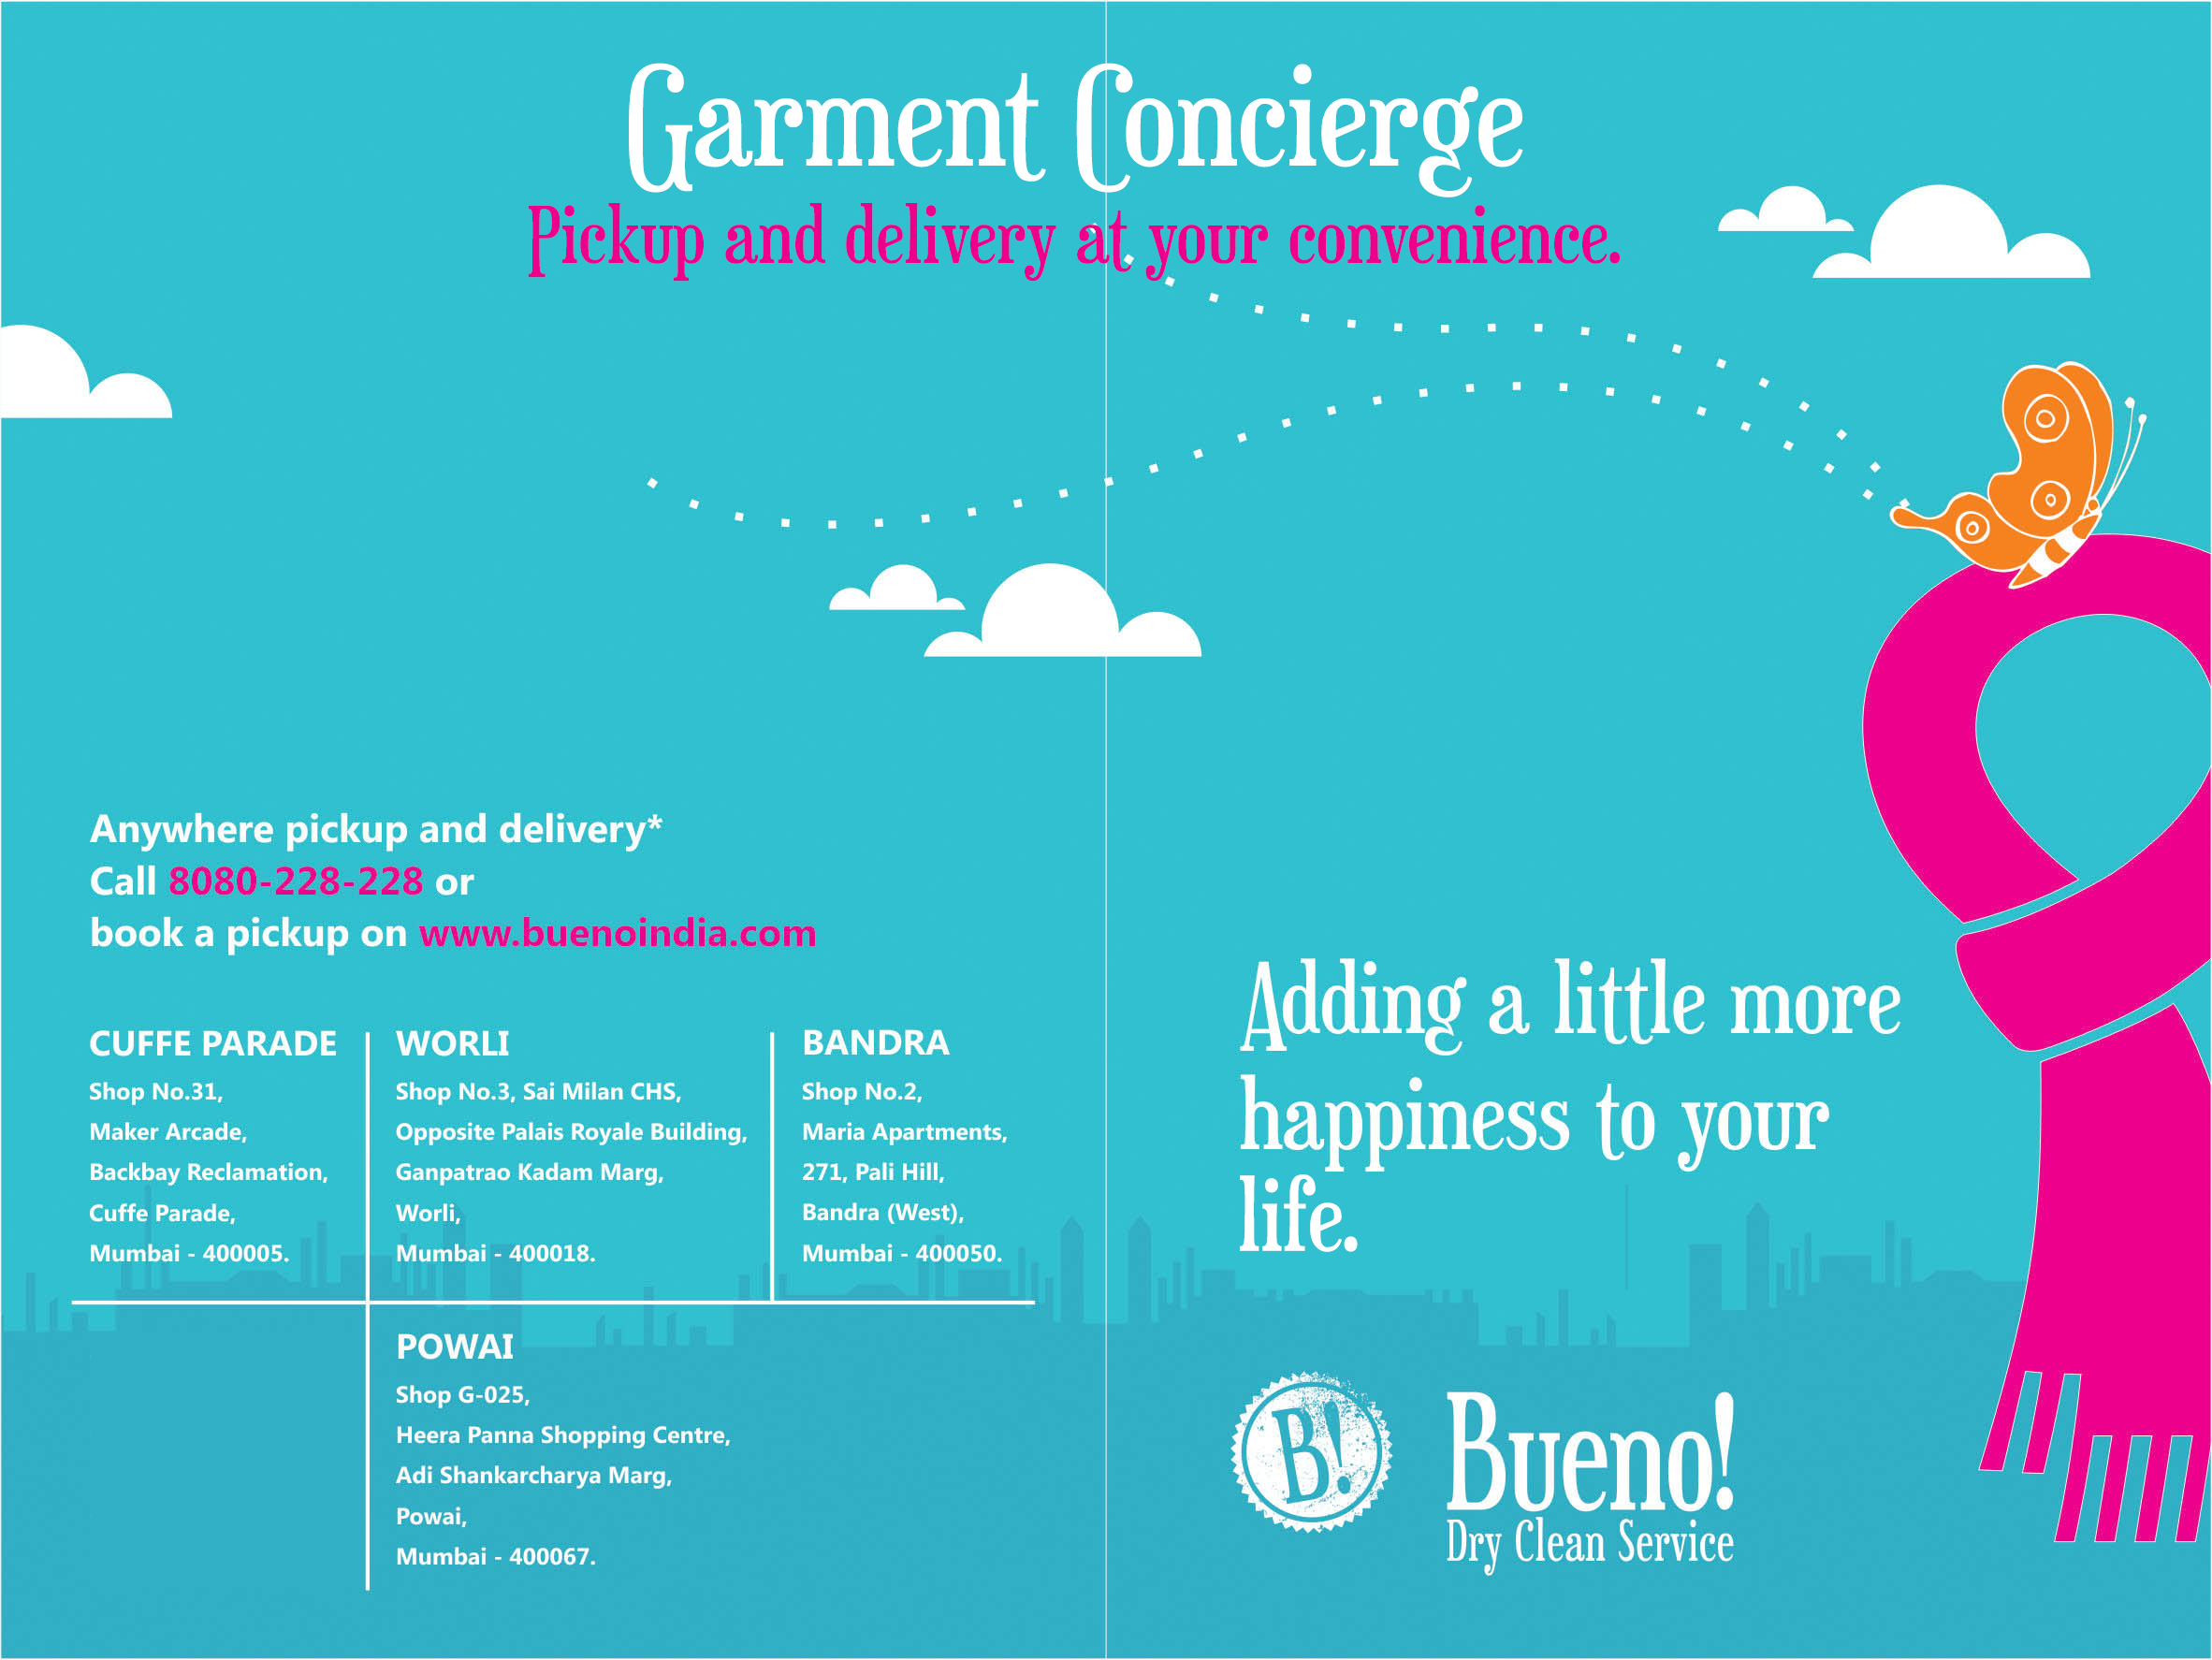 Bueno Garment Concierge Services Adding A Little More Happiness